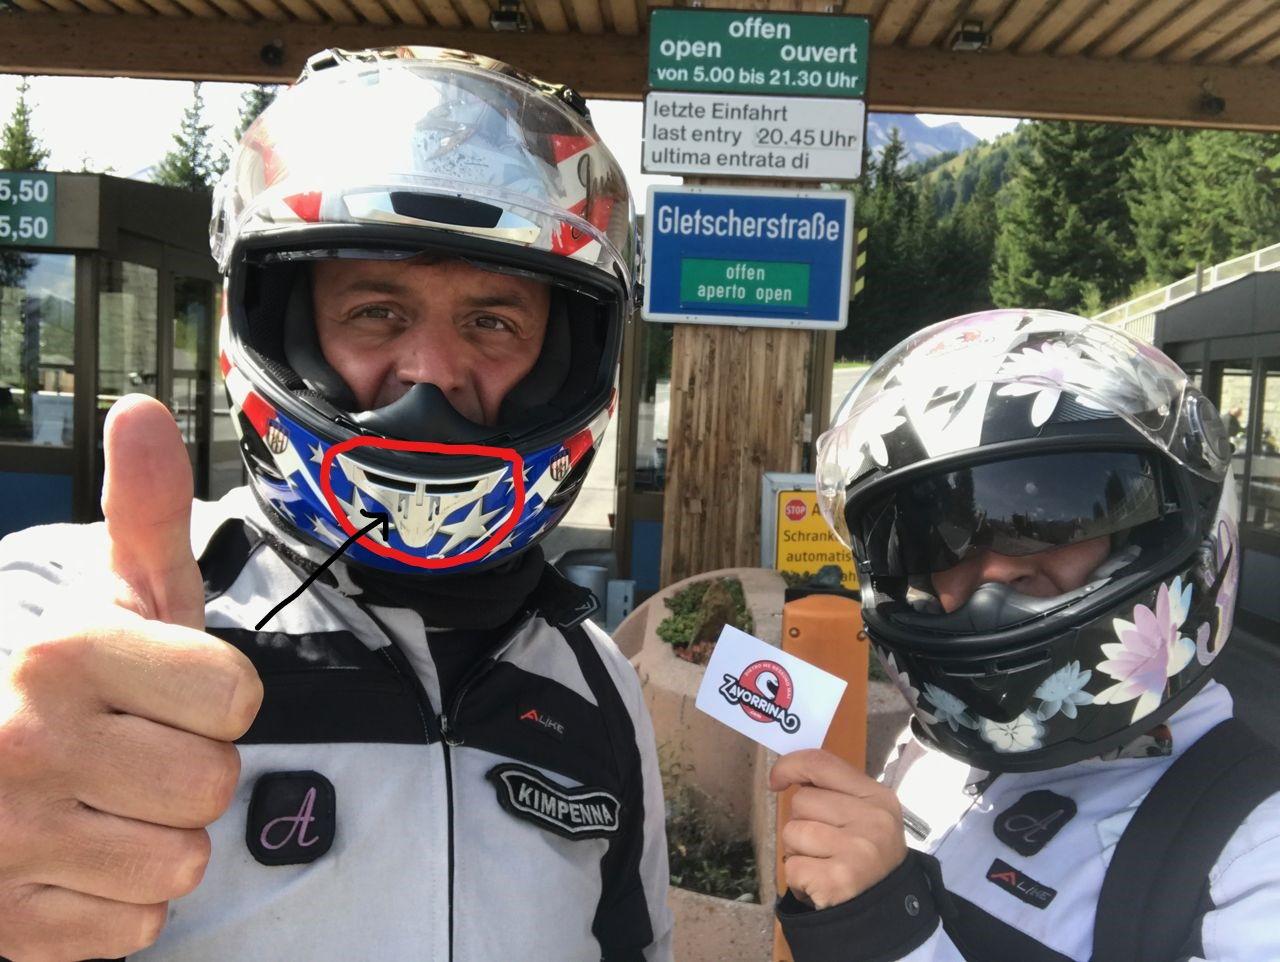 Casco Helmet Scorpion Pezzo Mancante